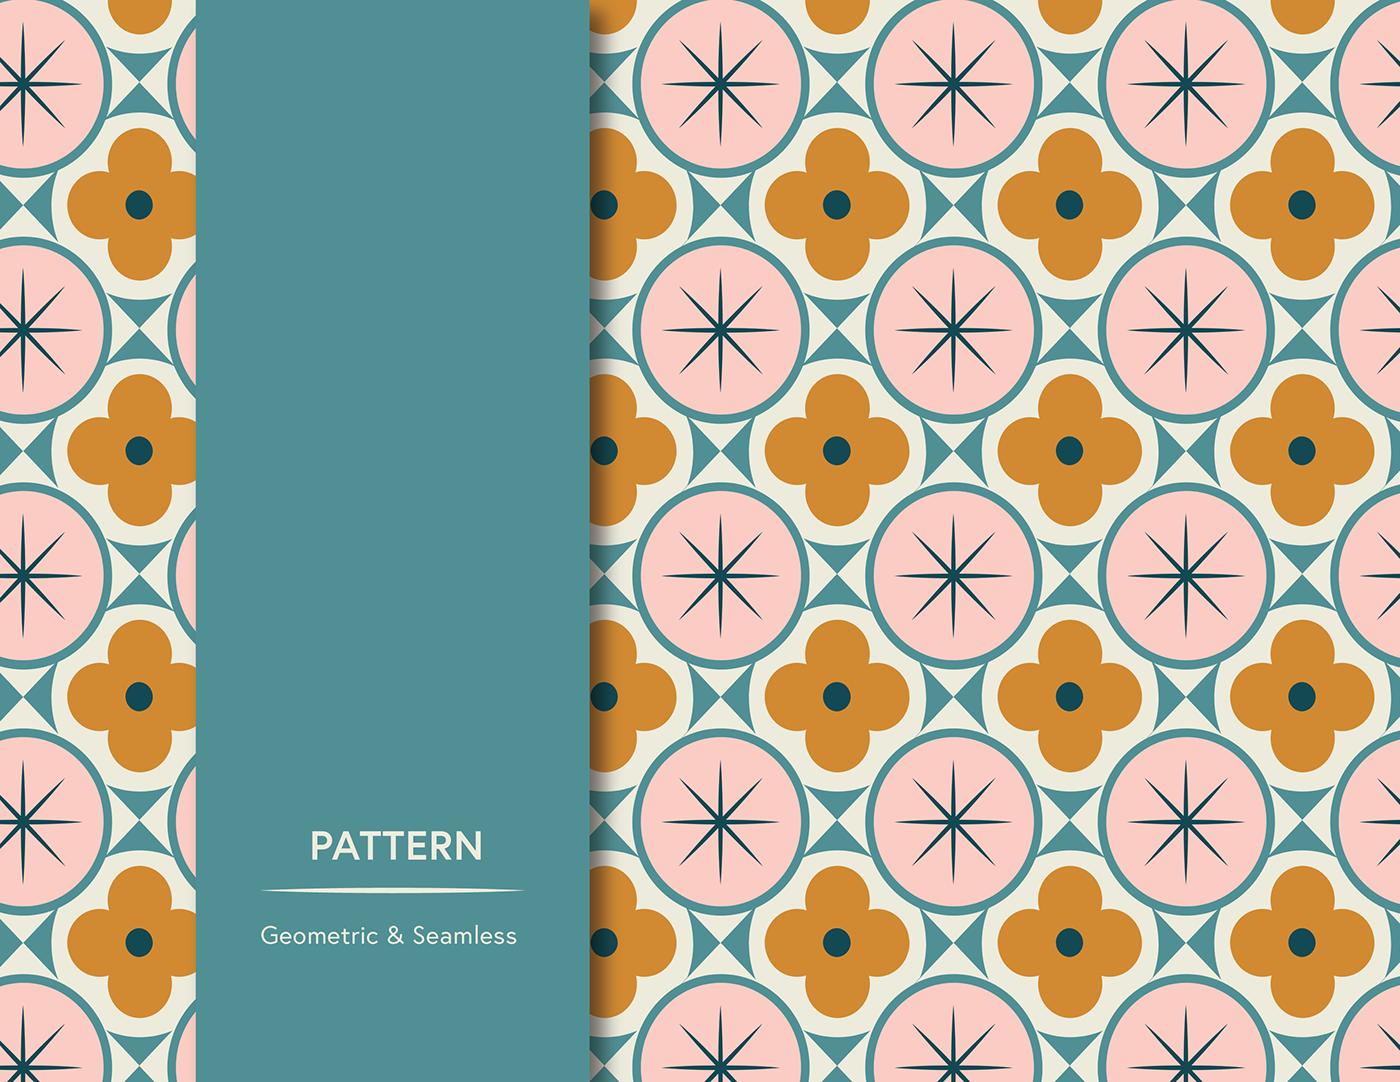 geometricpattern graphicdesign pattern seamlesspattern